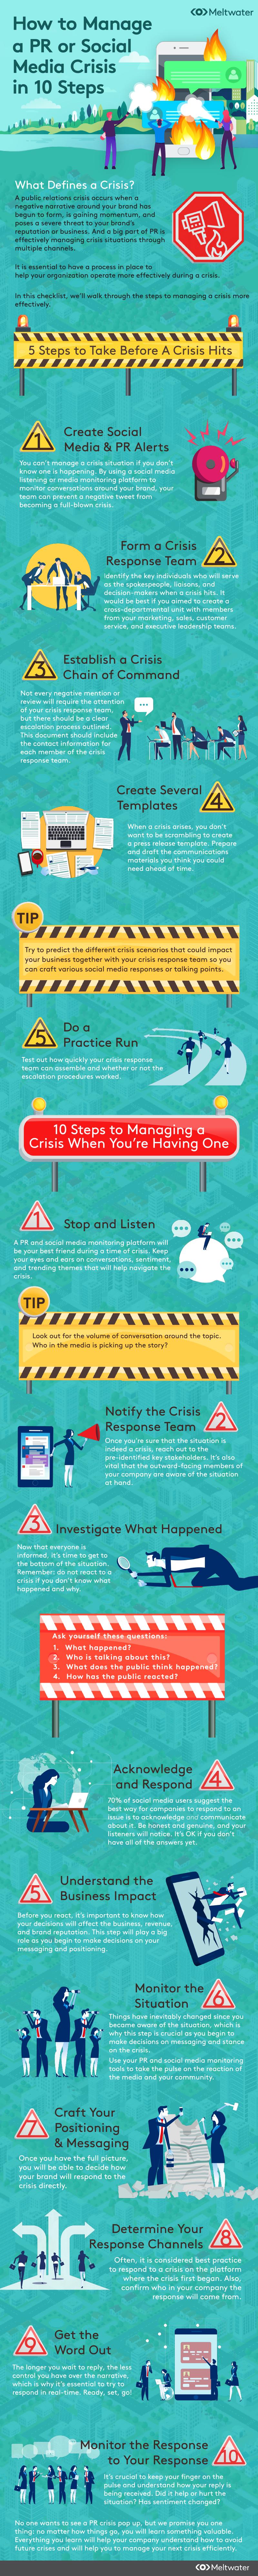 Pr Or Social Media Crisis Infographic Social Media Infographic Social Media Social Media Listening